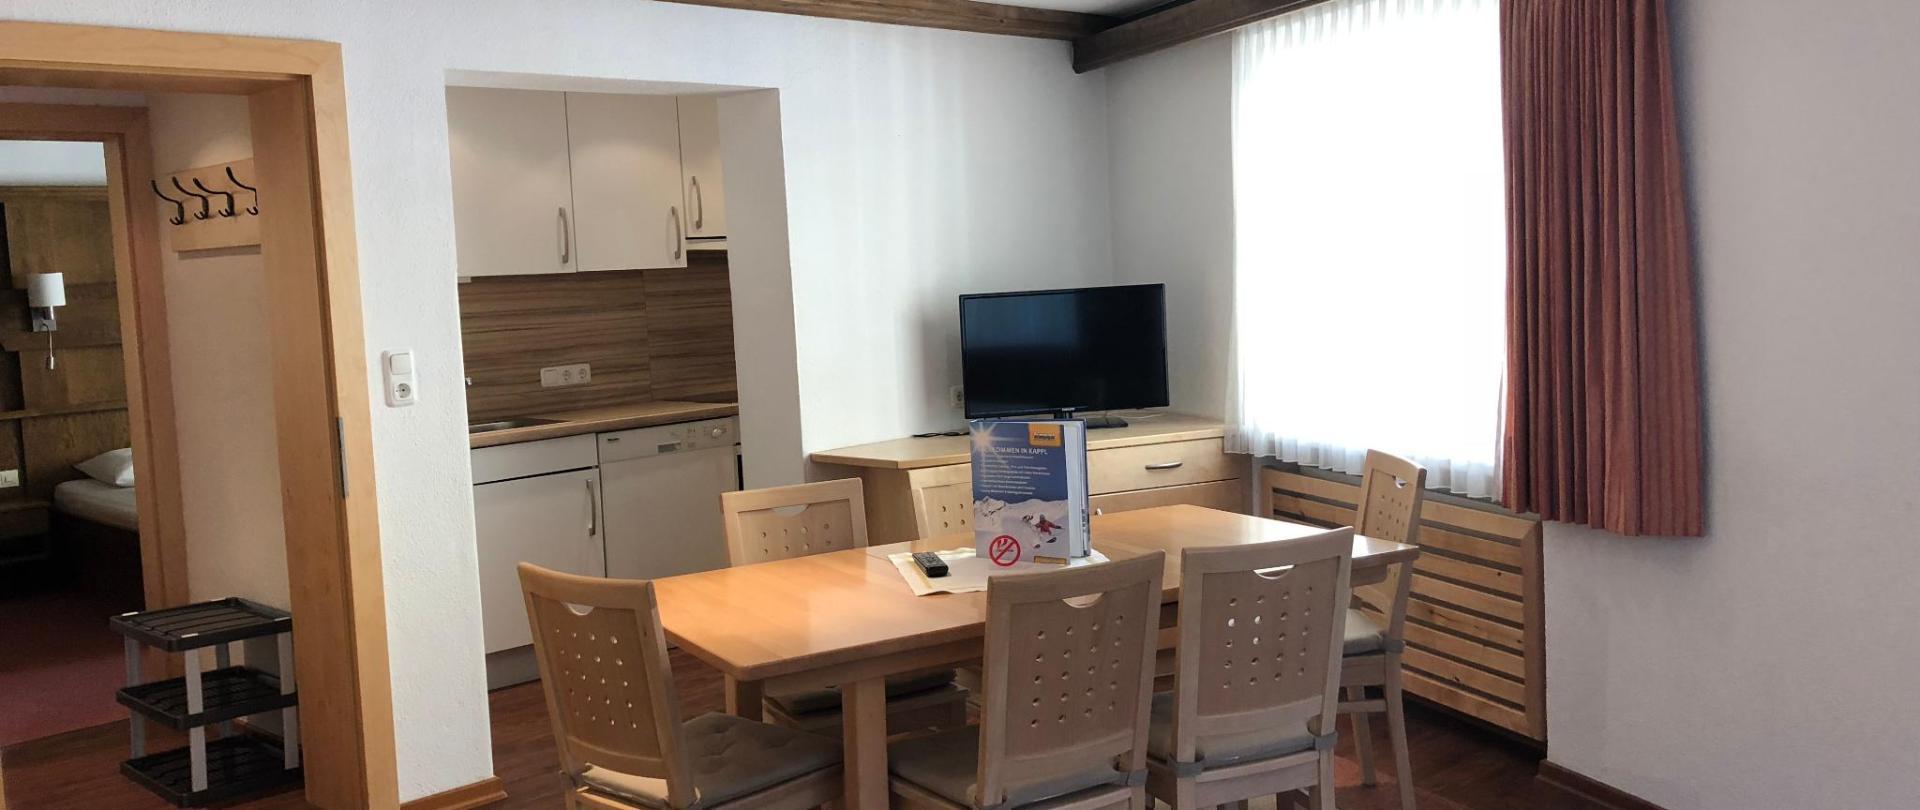 Wohnraum_Apartment_Comfort.jpg